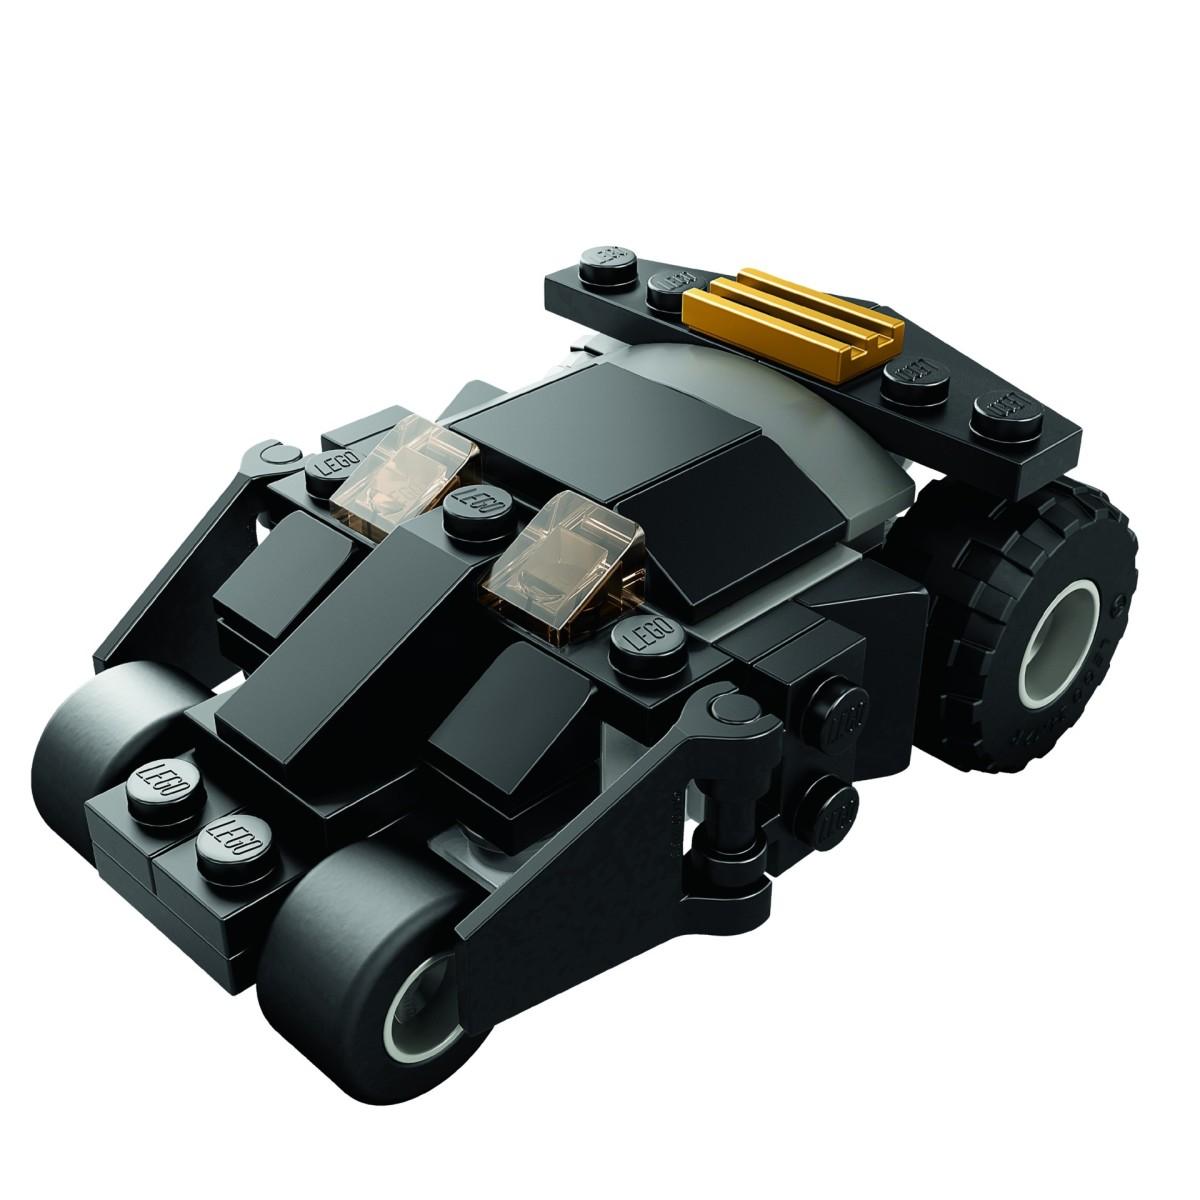 LEGO Tumbler 30300 Assembled